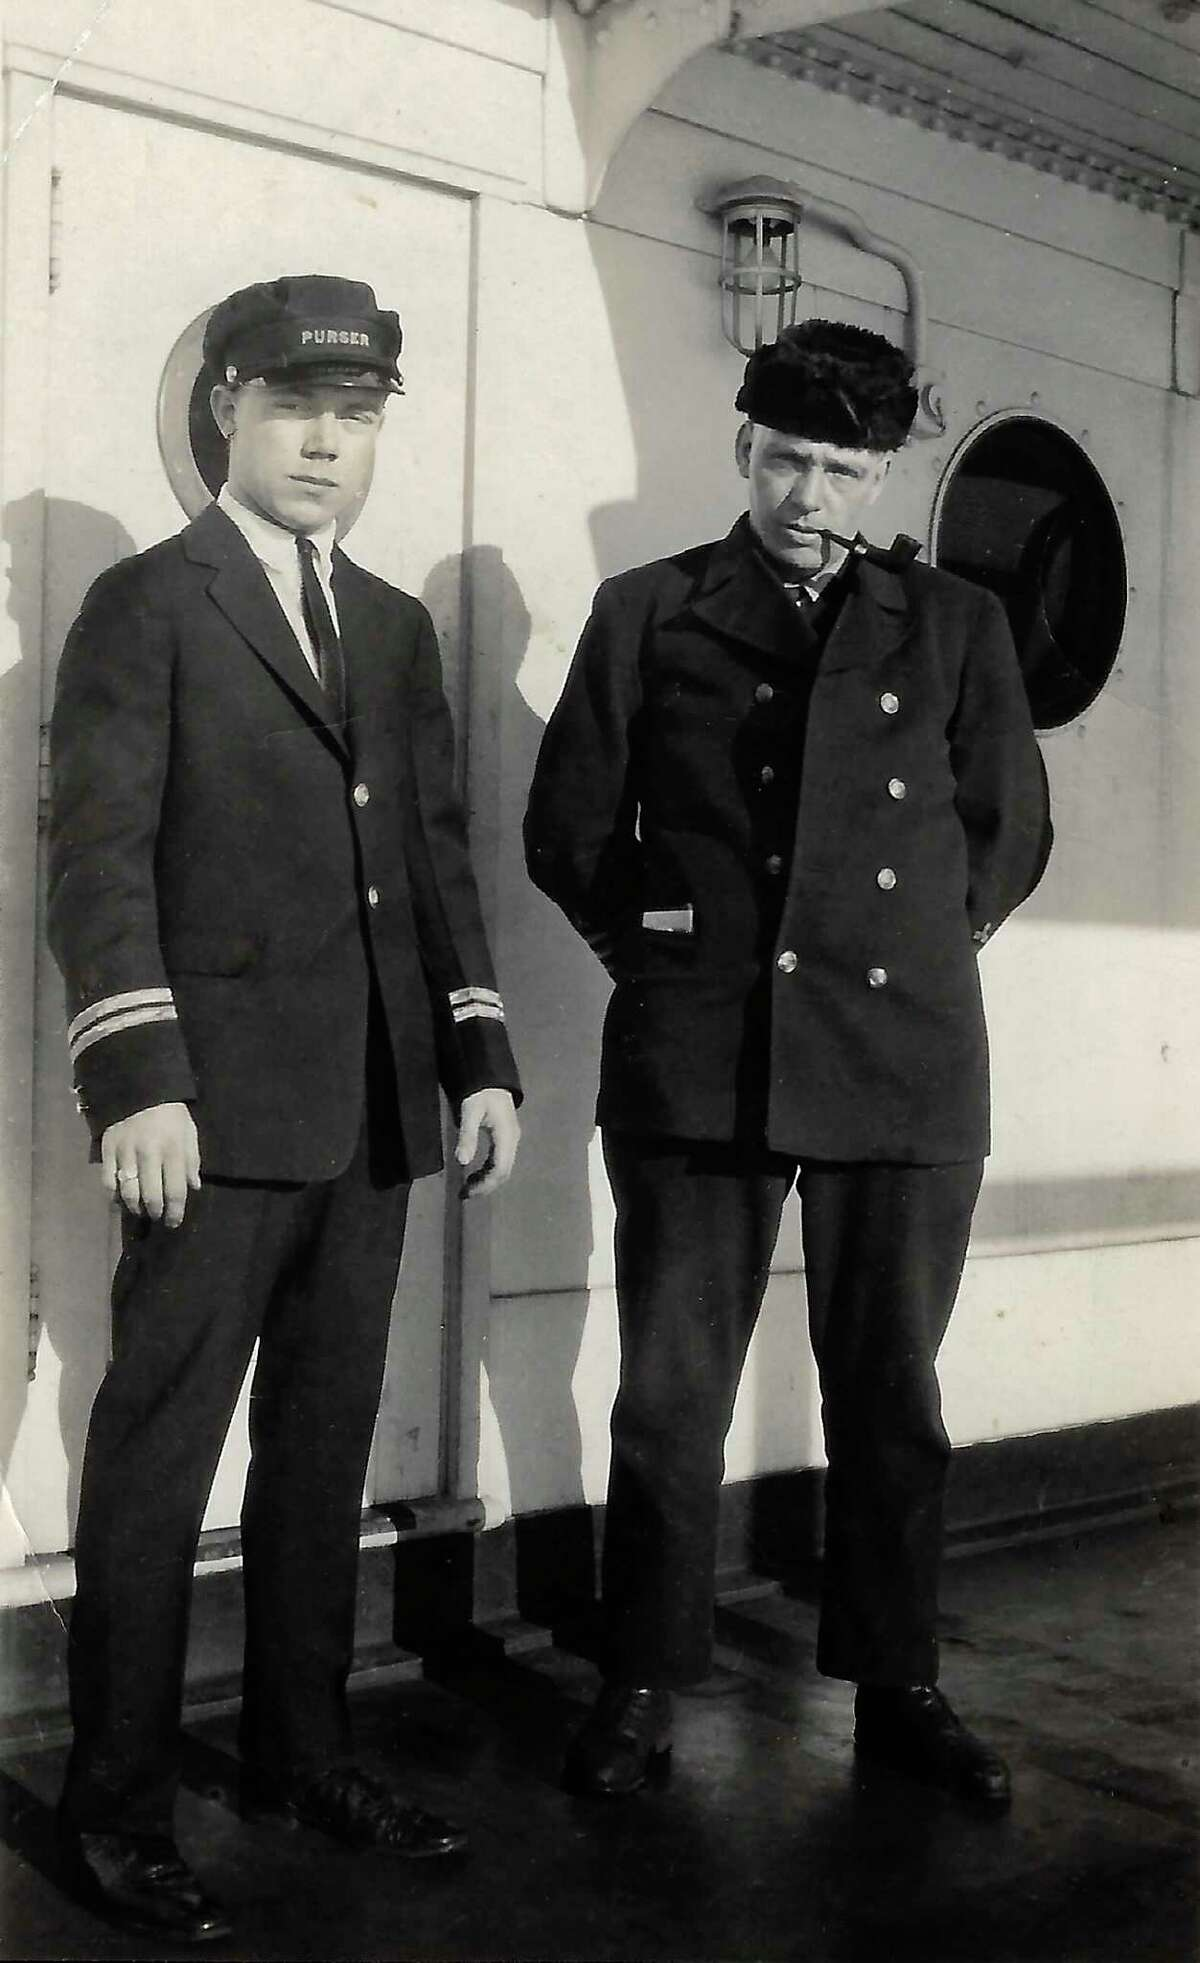 Chief Engineer Stanley Hawkins and Purser Elliott Jacobsen on the Ann Arbor #7. (Courtesy Photo)